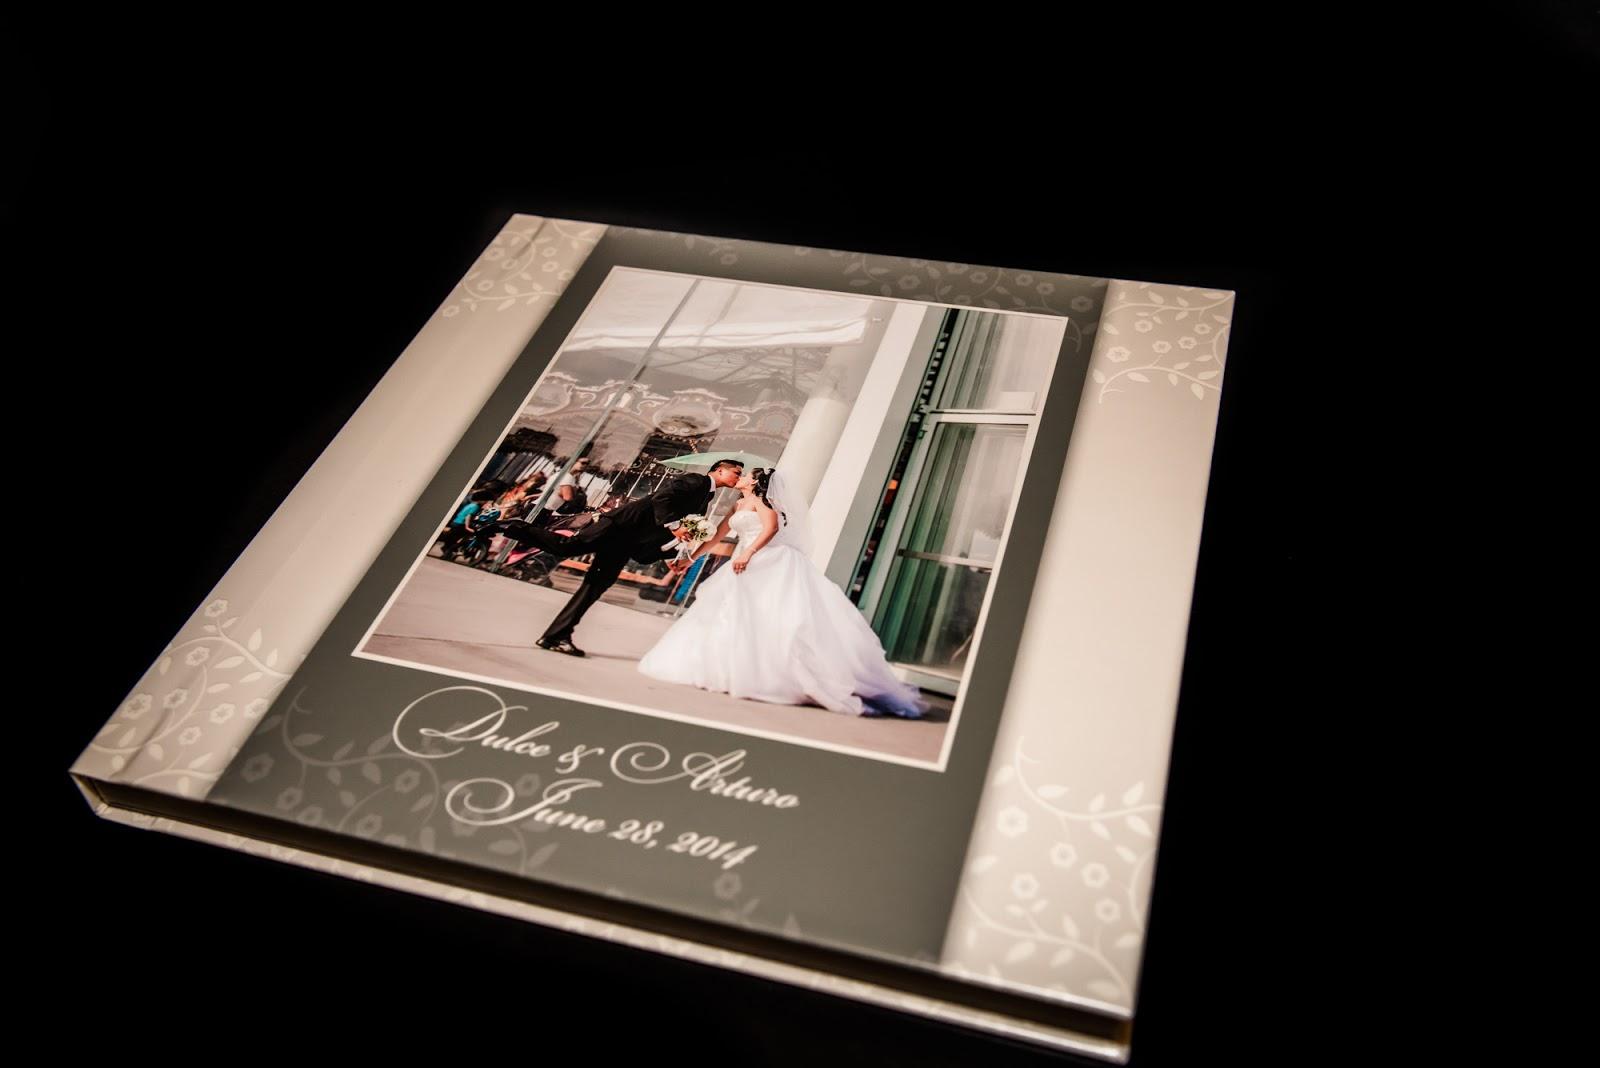 wedding photographer album design